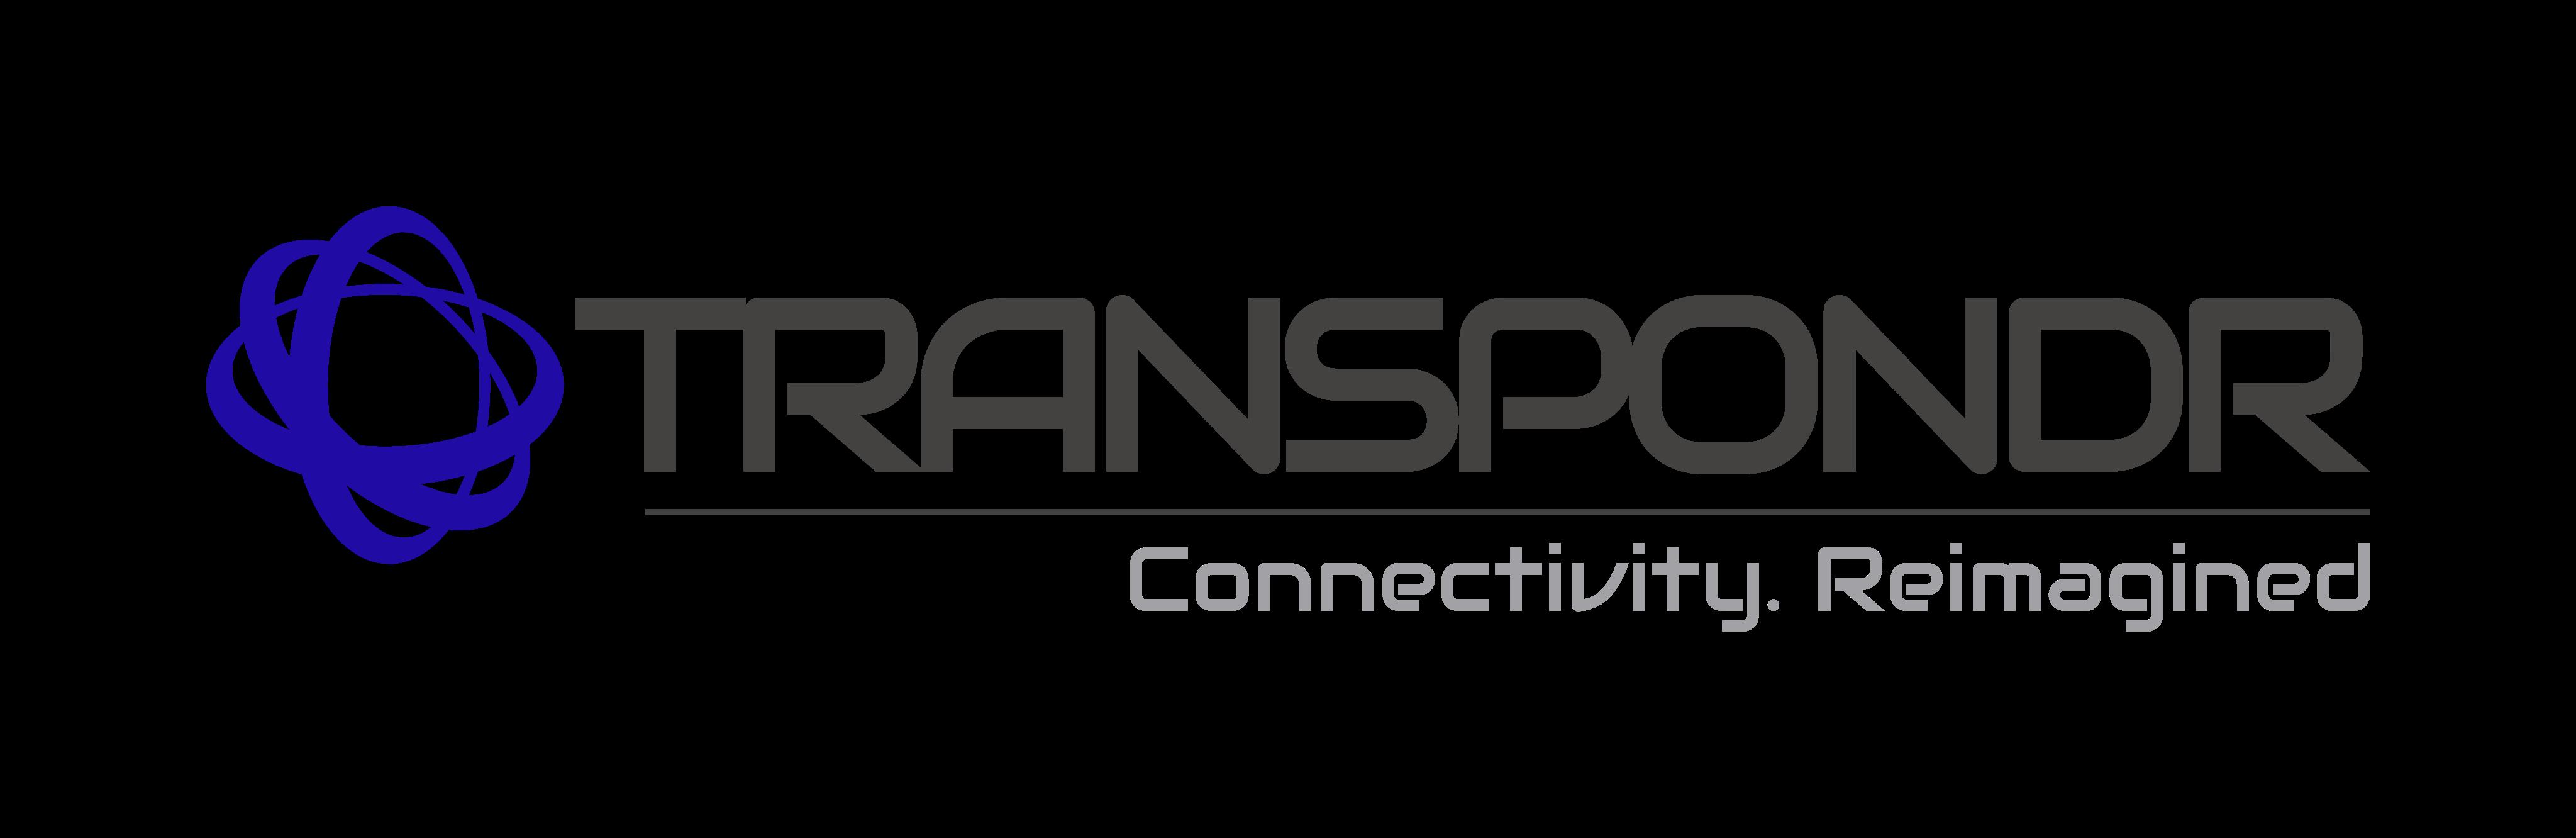 Transpondr